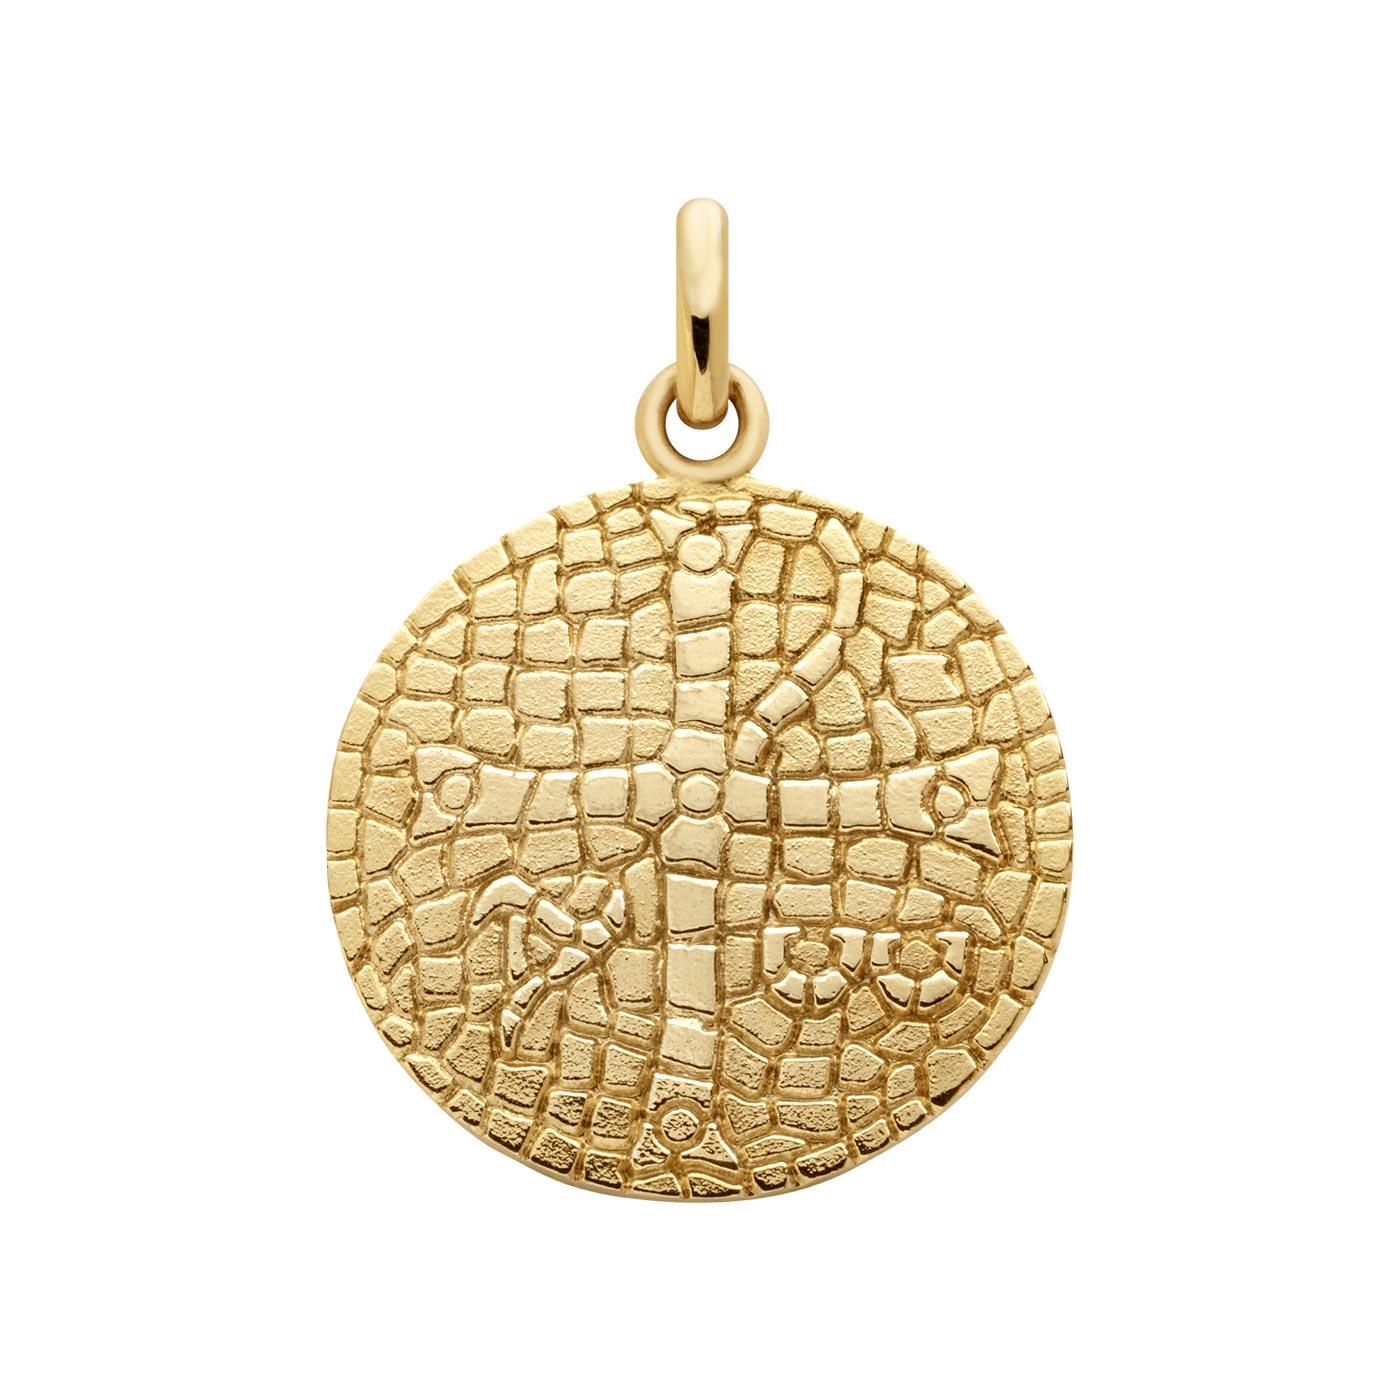 Médaille Arthus Bertrand Alpha & Oméga en or jaune, 18mm